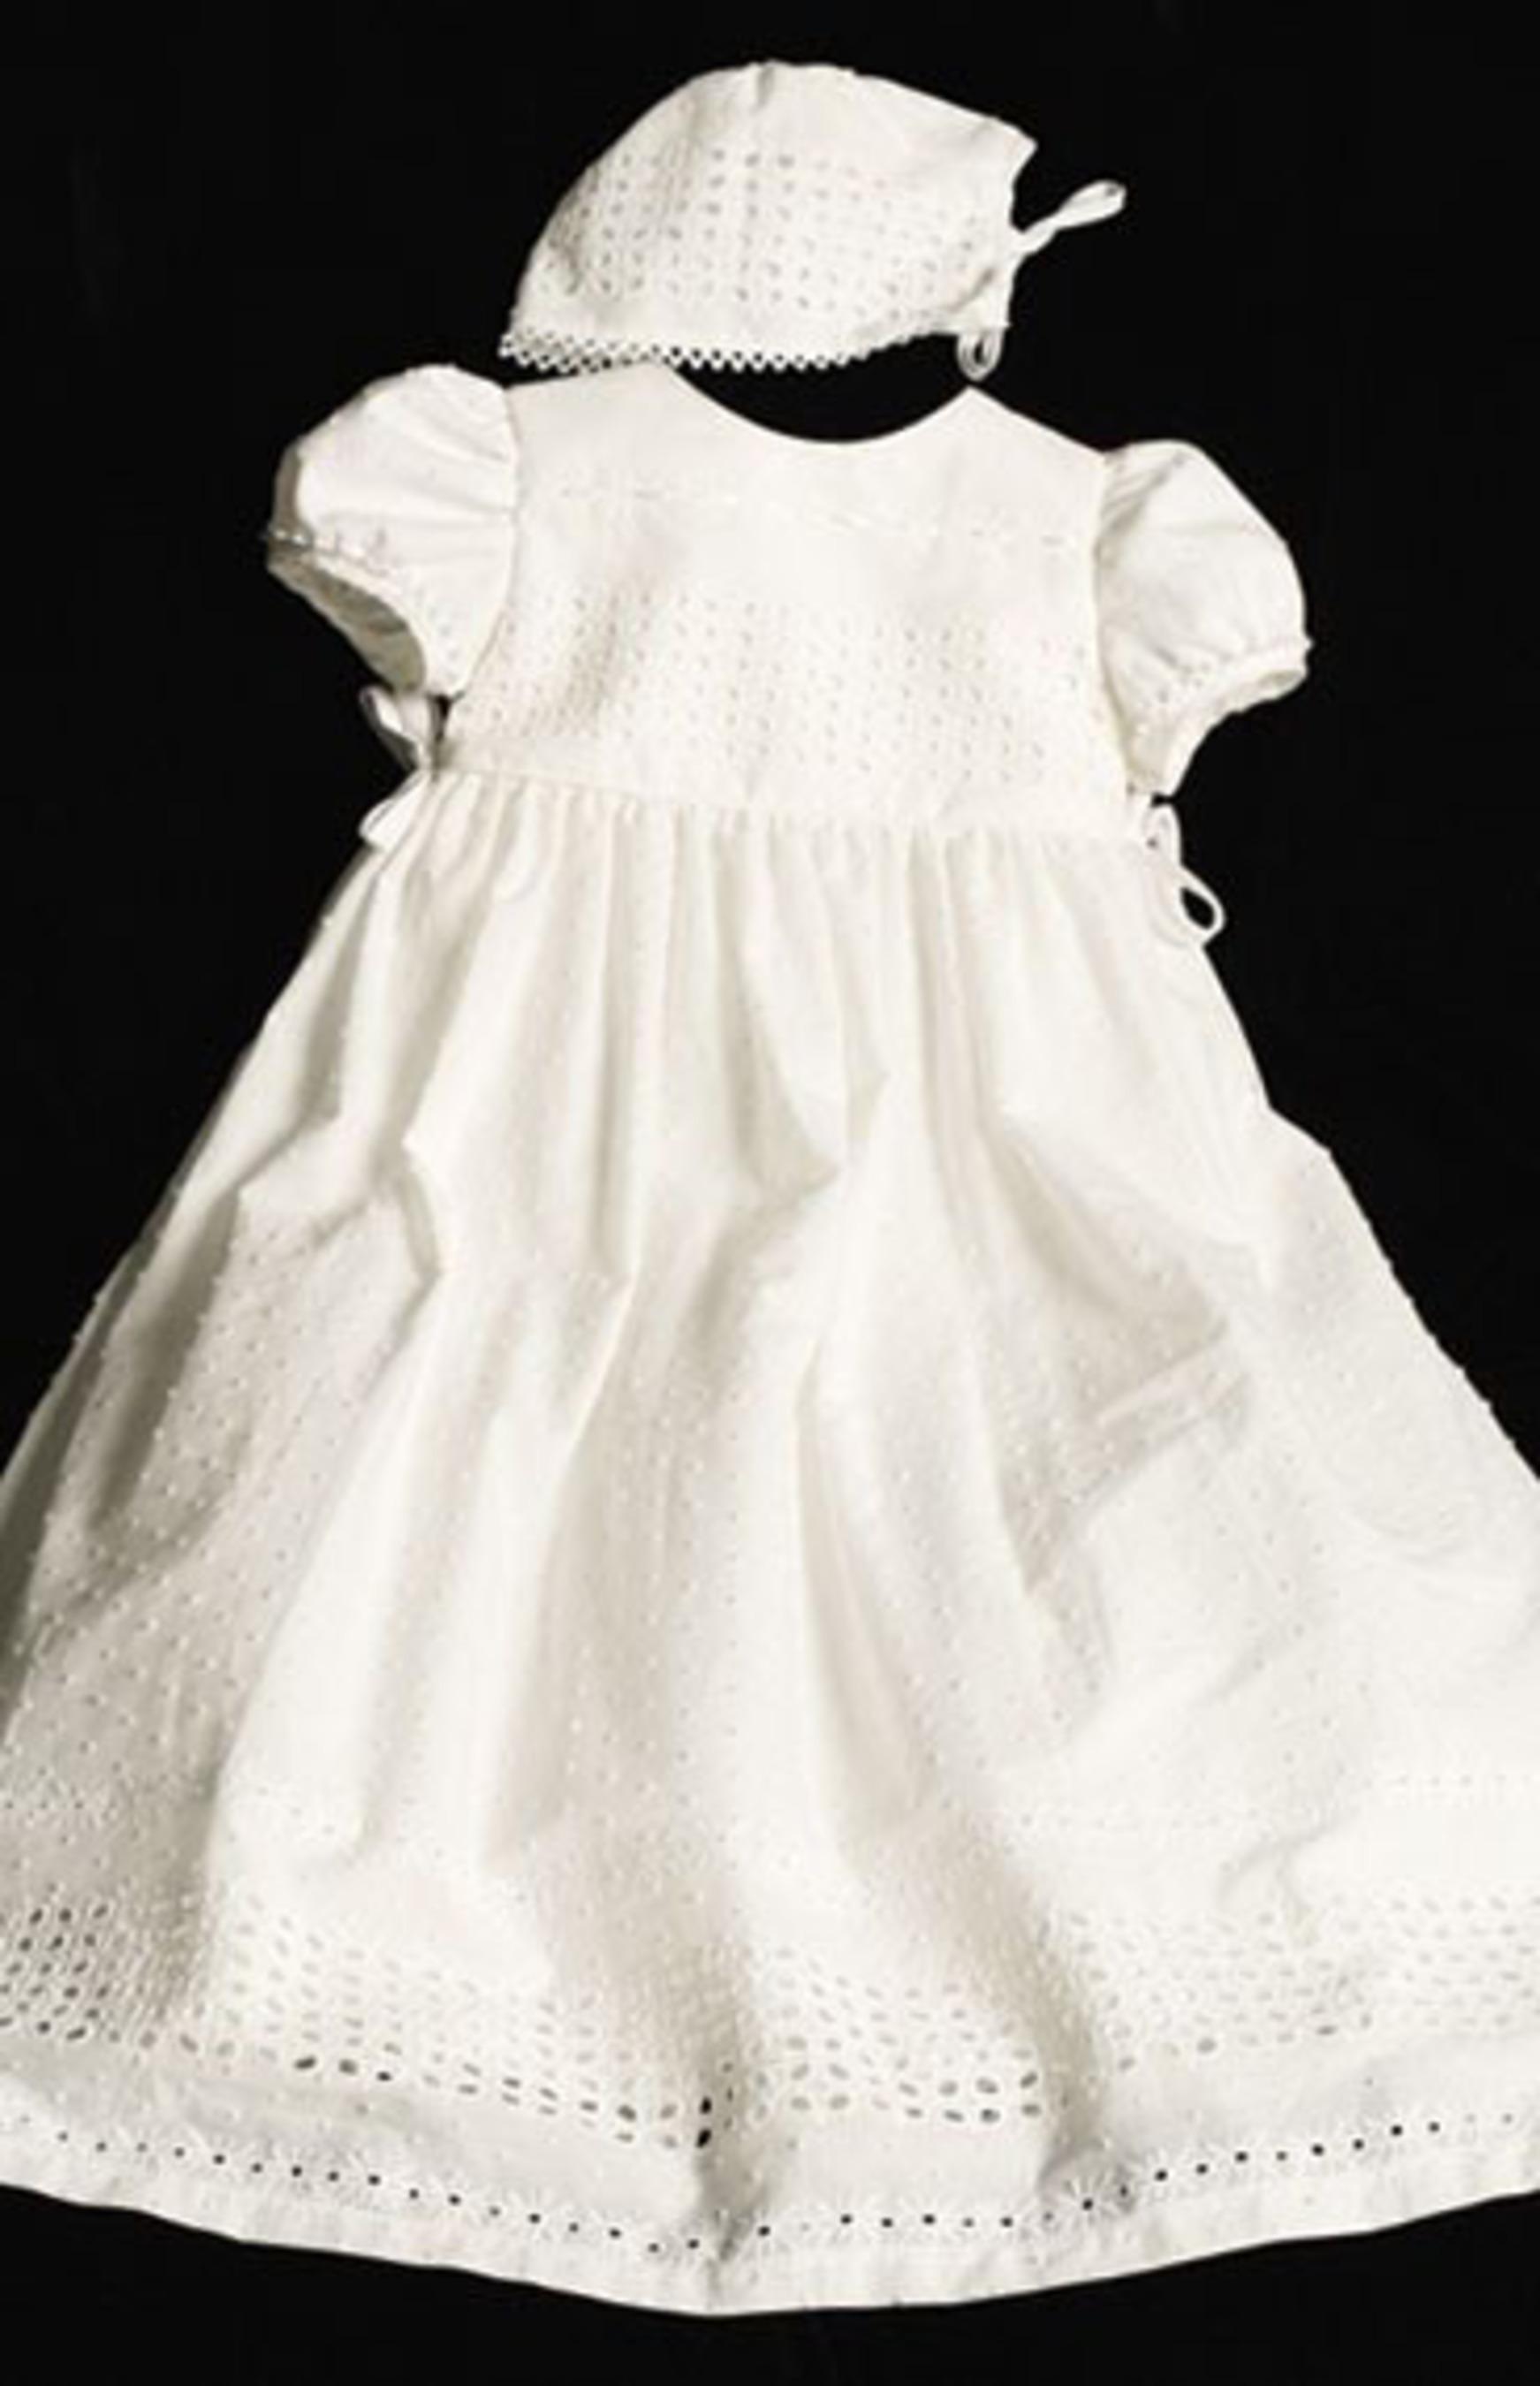 Noori Christening Dresses.  (PRNewsFoto/Noori Dresses)